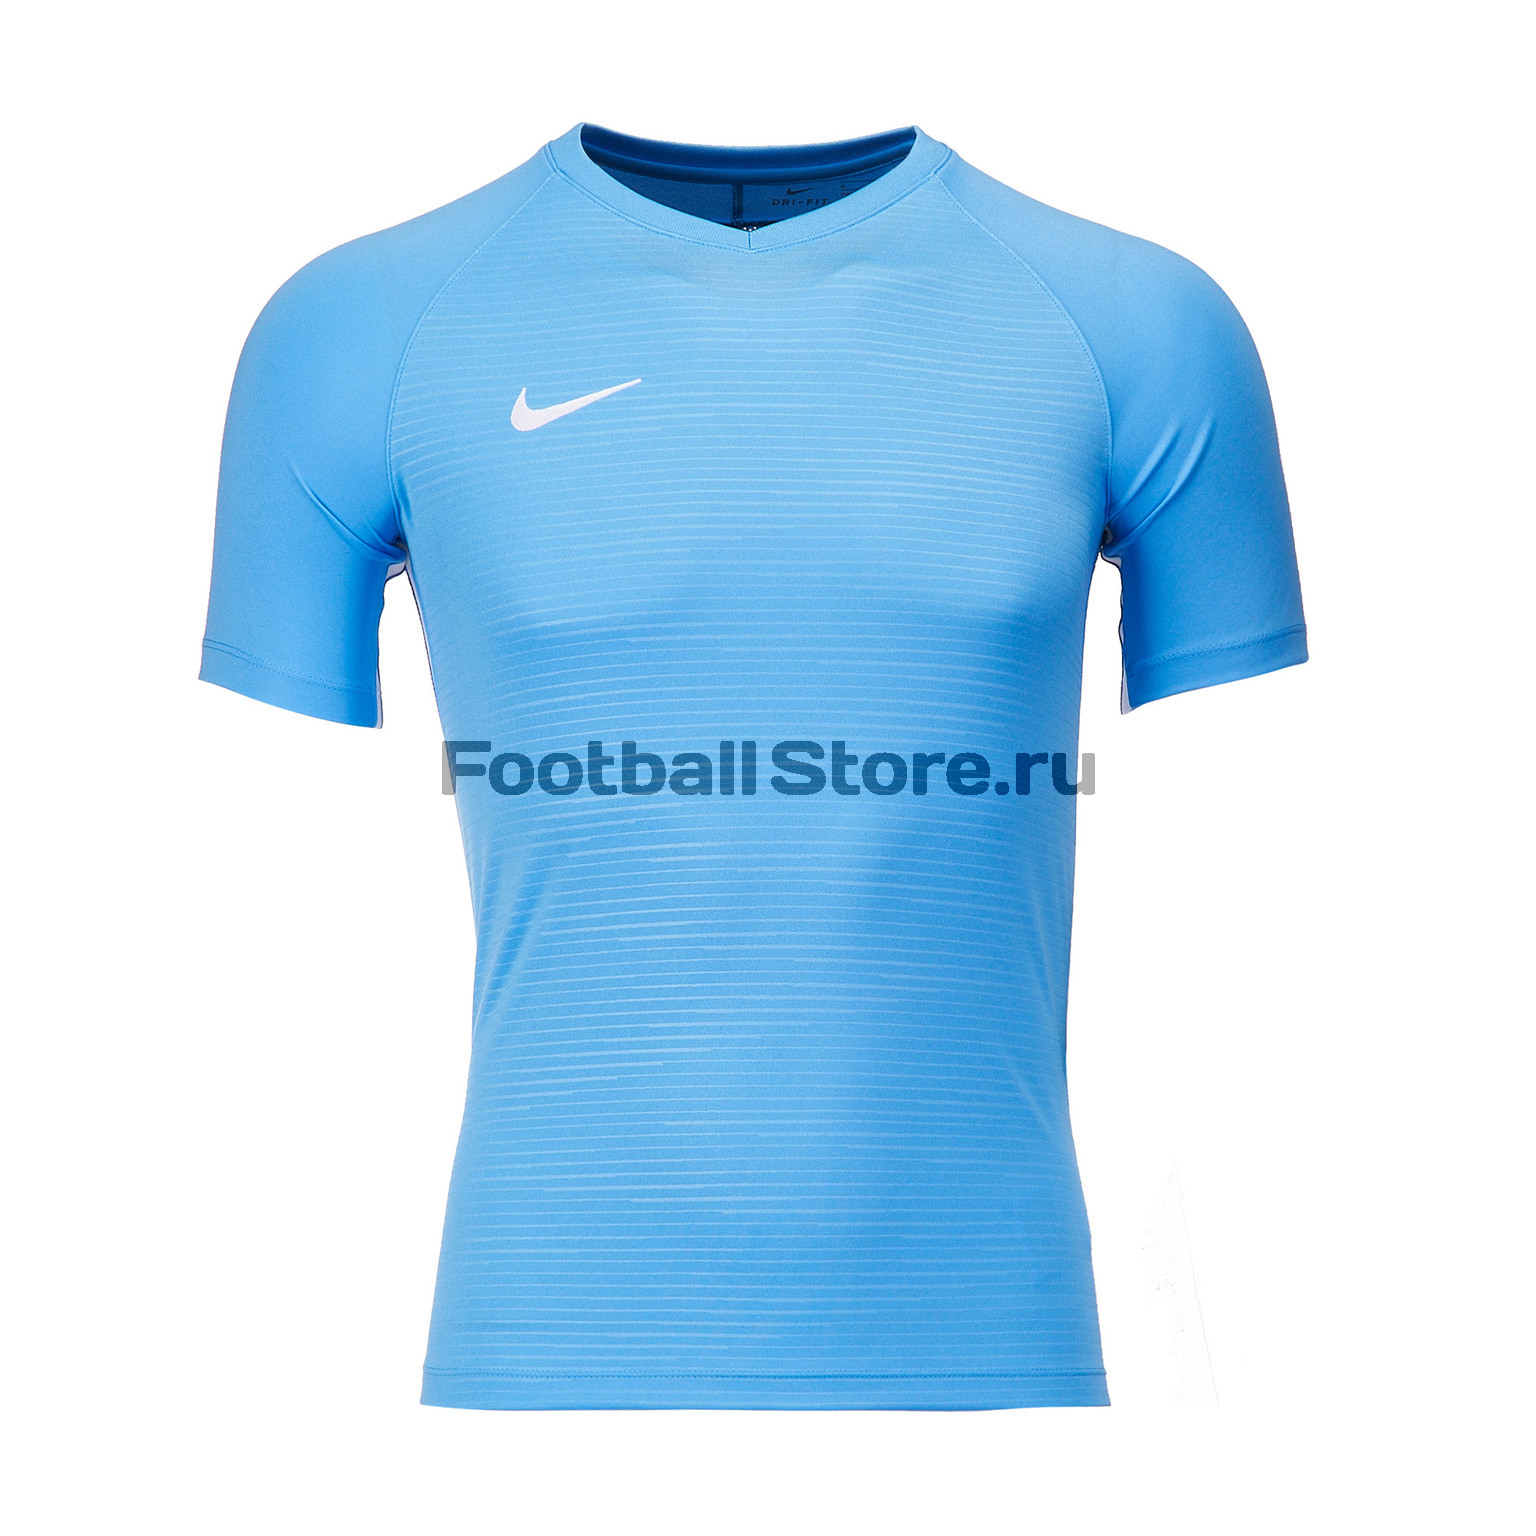 Футболка детская Nike Dry Tiempo Premier 894111-412 футболка игровая nike dry tiempo prem jsy ss 894230 411